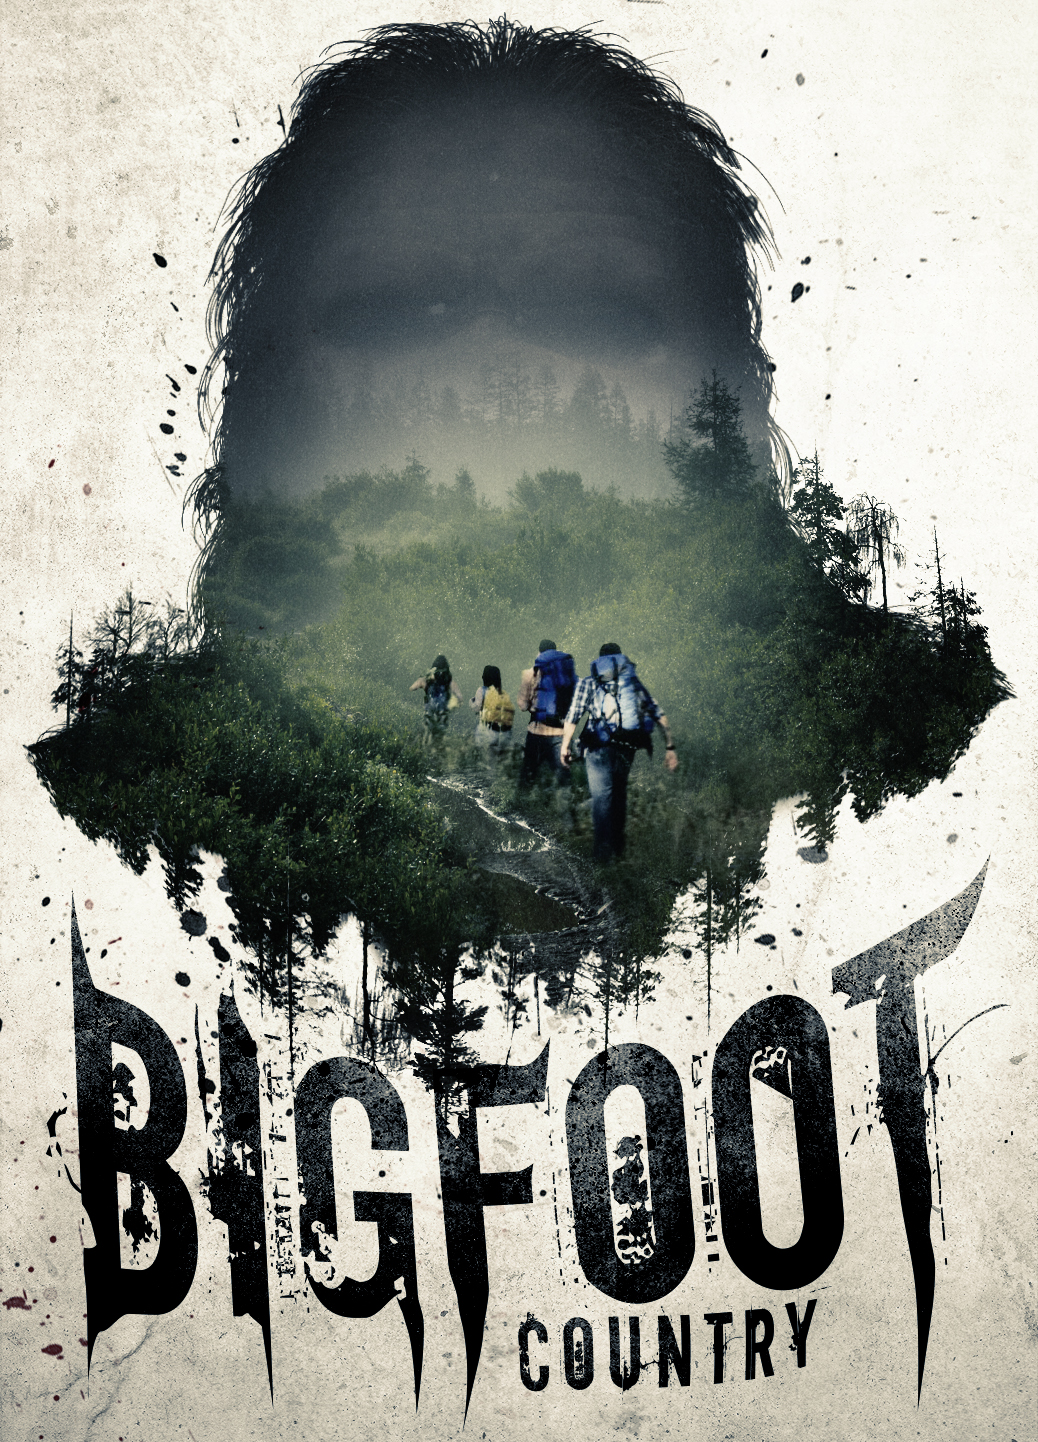 - Imdb 2017 Country Bigfoot video